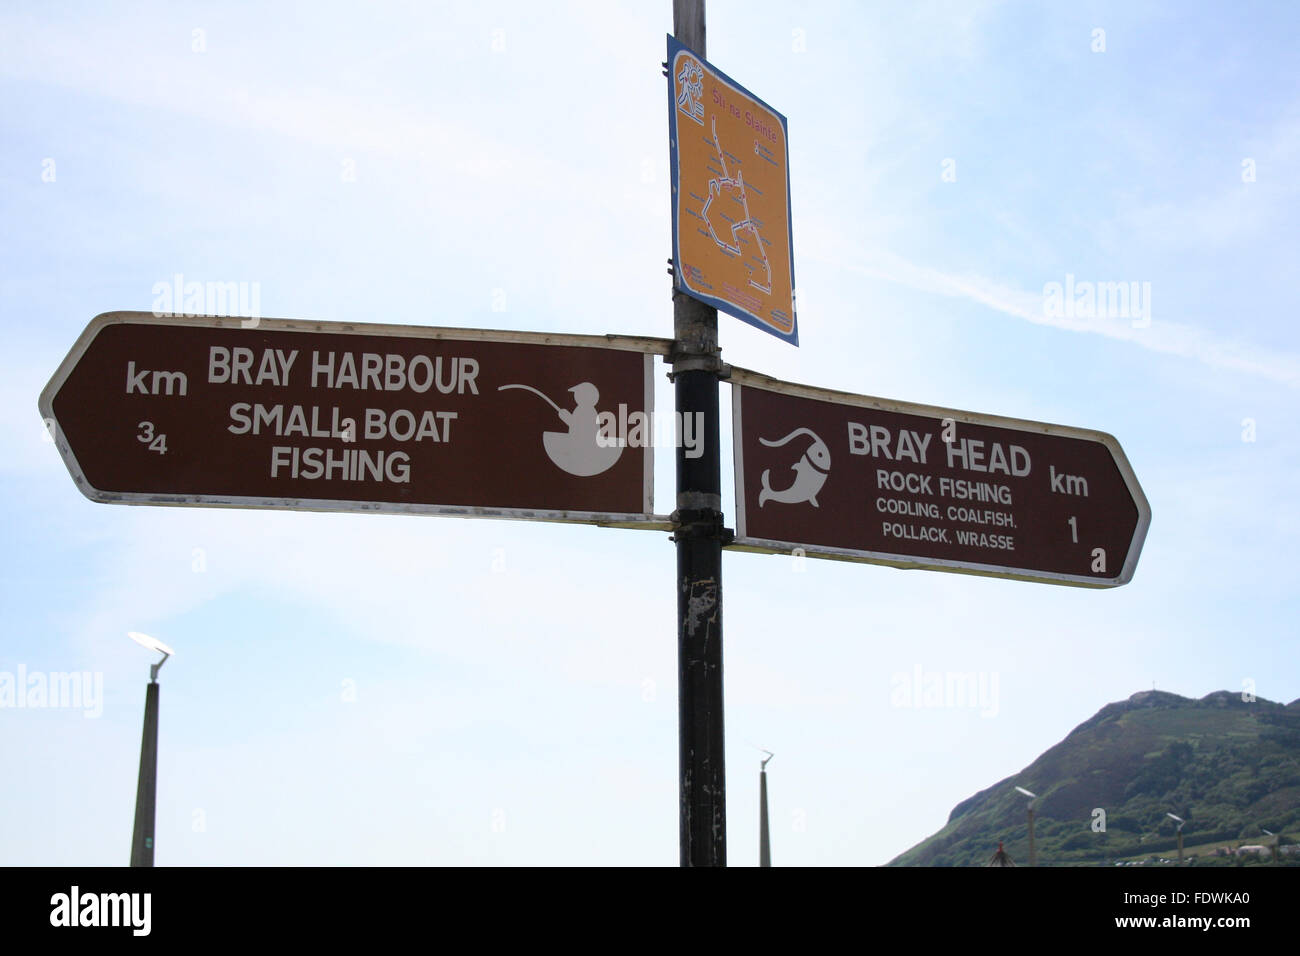 Bray harbour, bray head, beach in Co. Dublin, Ireland - Stock Image